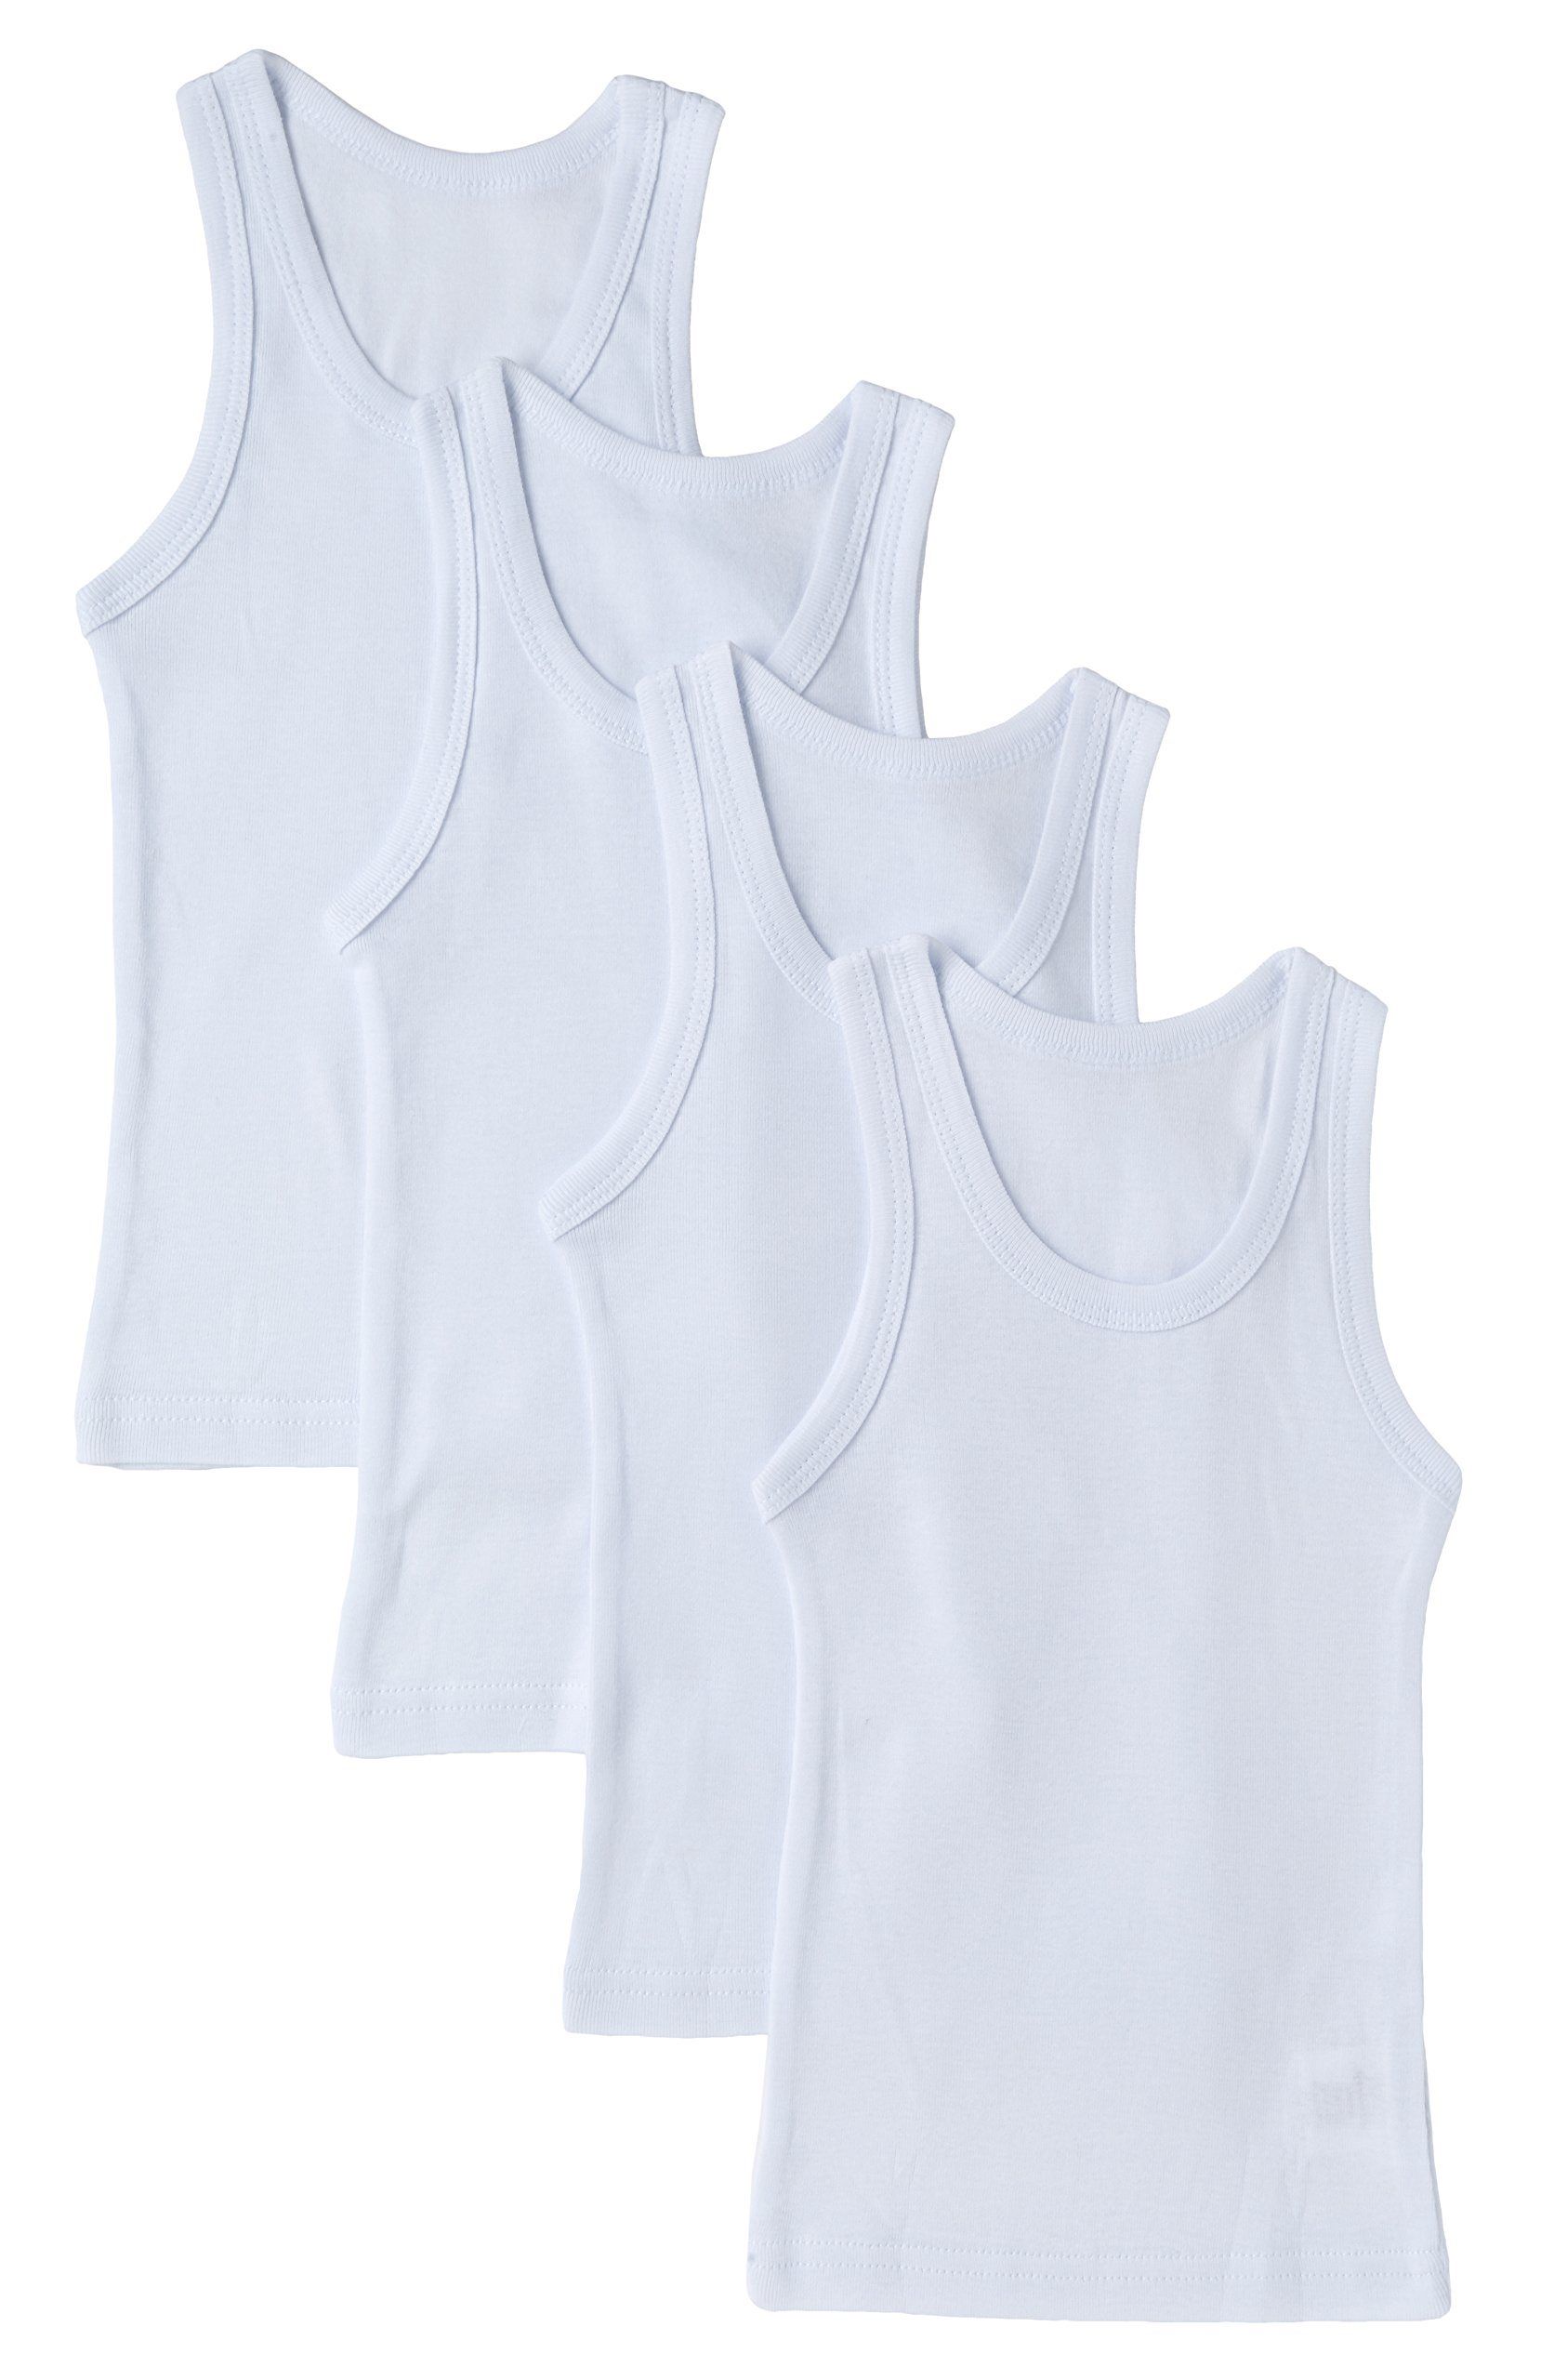 Sportoli Boys Ultra Soft 100% Cotton White Tank Top Undershirts - Size 3/4